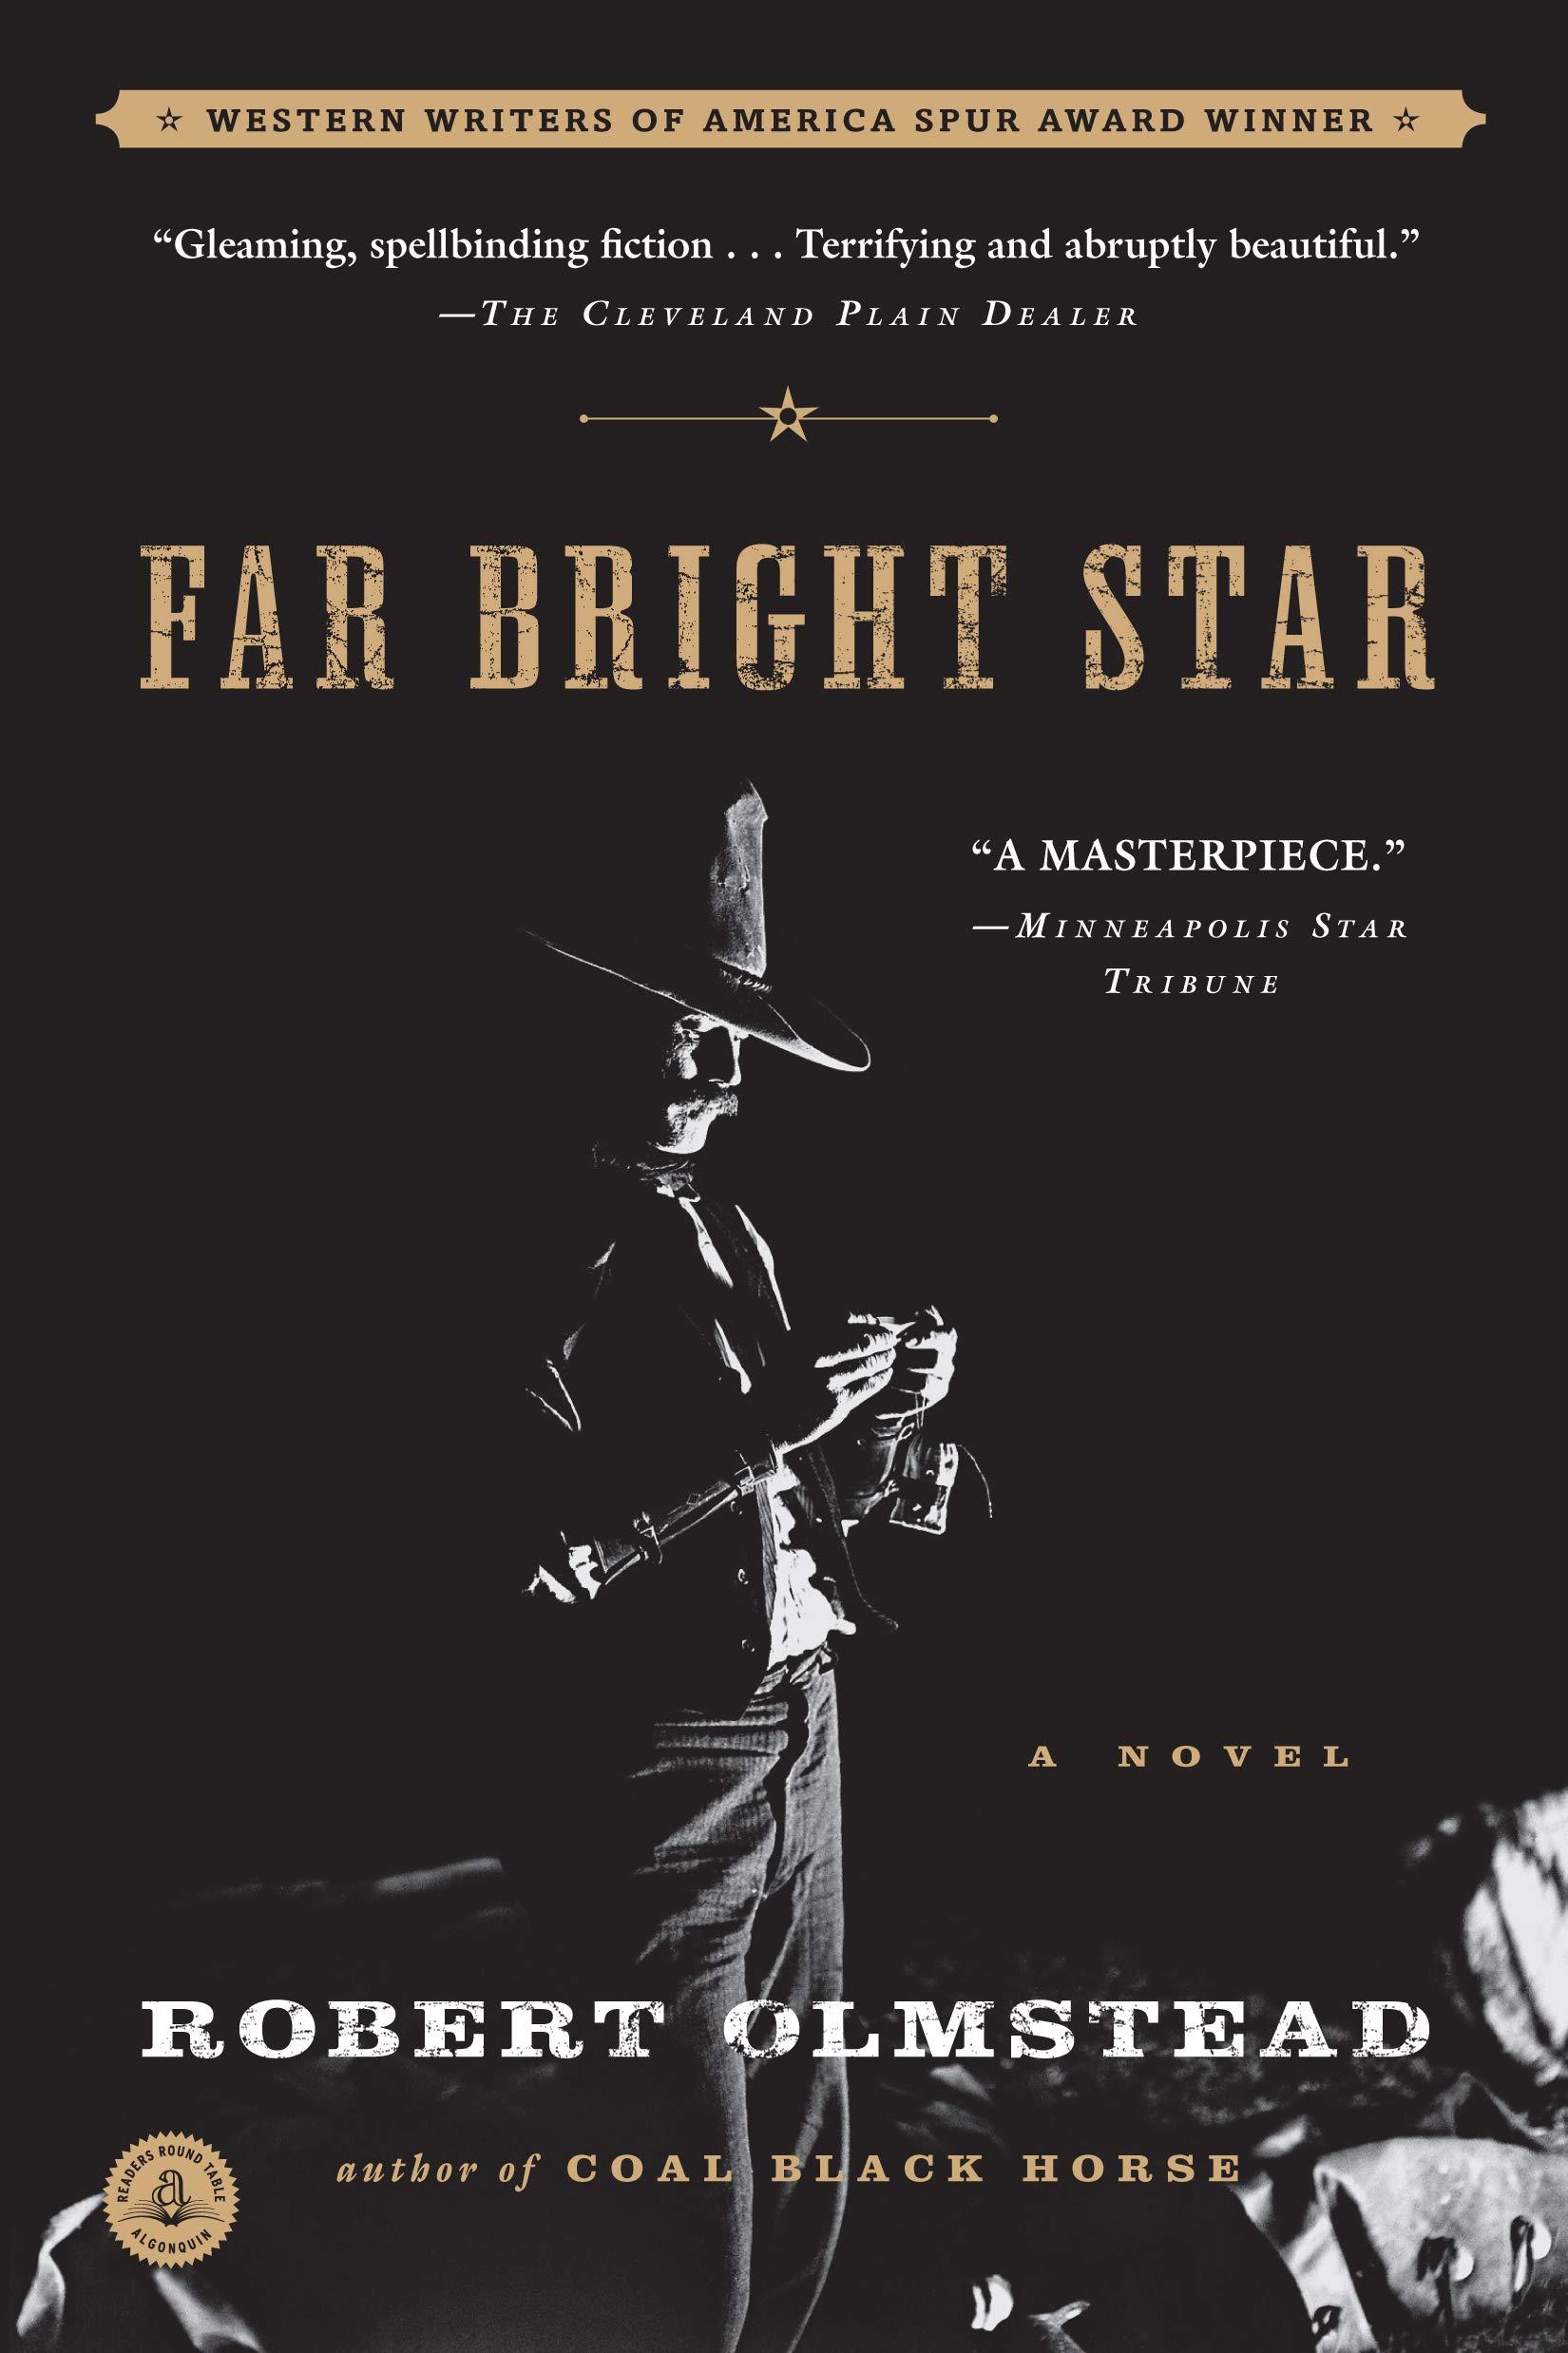 Download Filme Far Bright Star Torrent 2022 Qualidade Hd